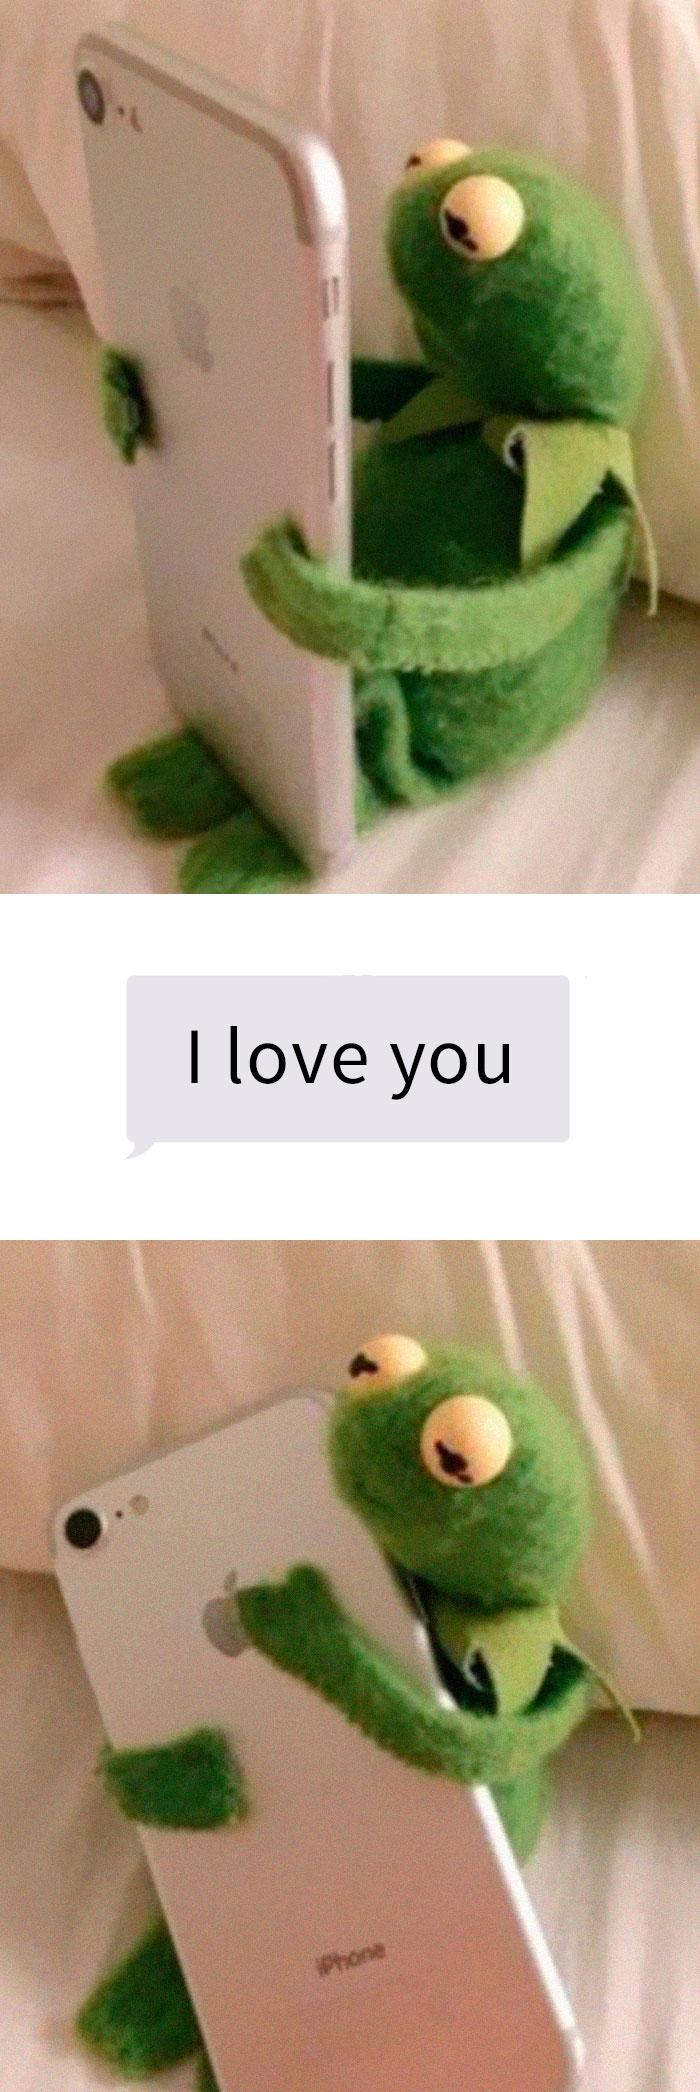 23 Sickeningly Sappy Relationship Memes Memebase Funny Memes